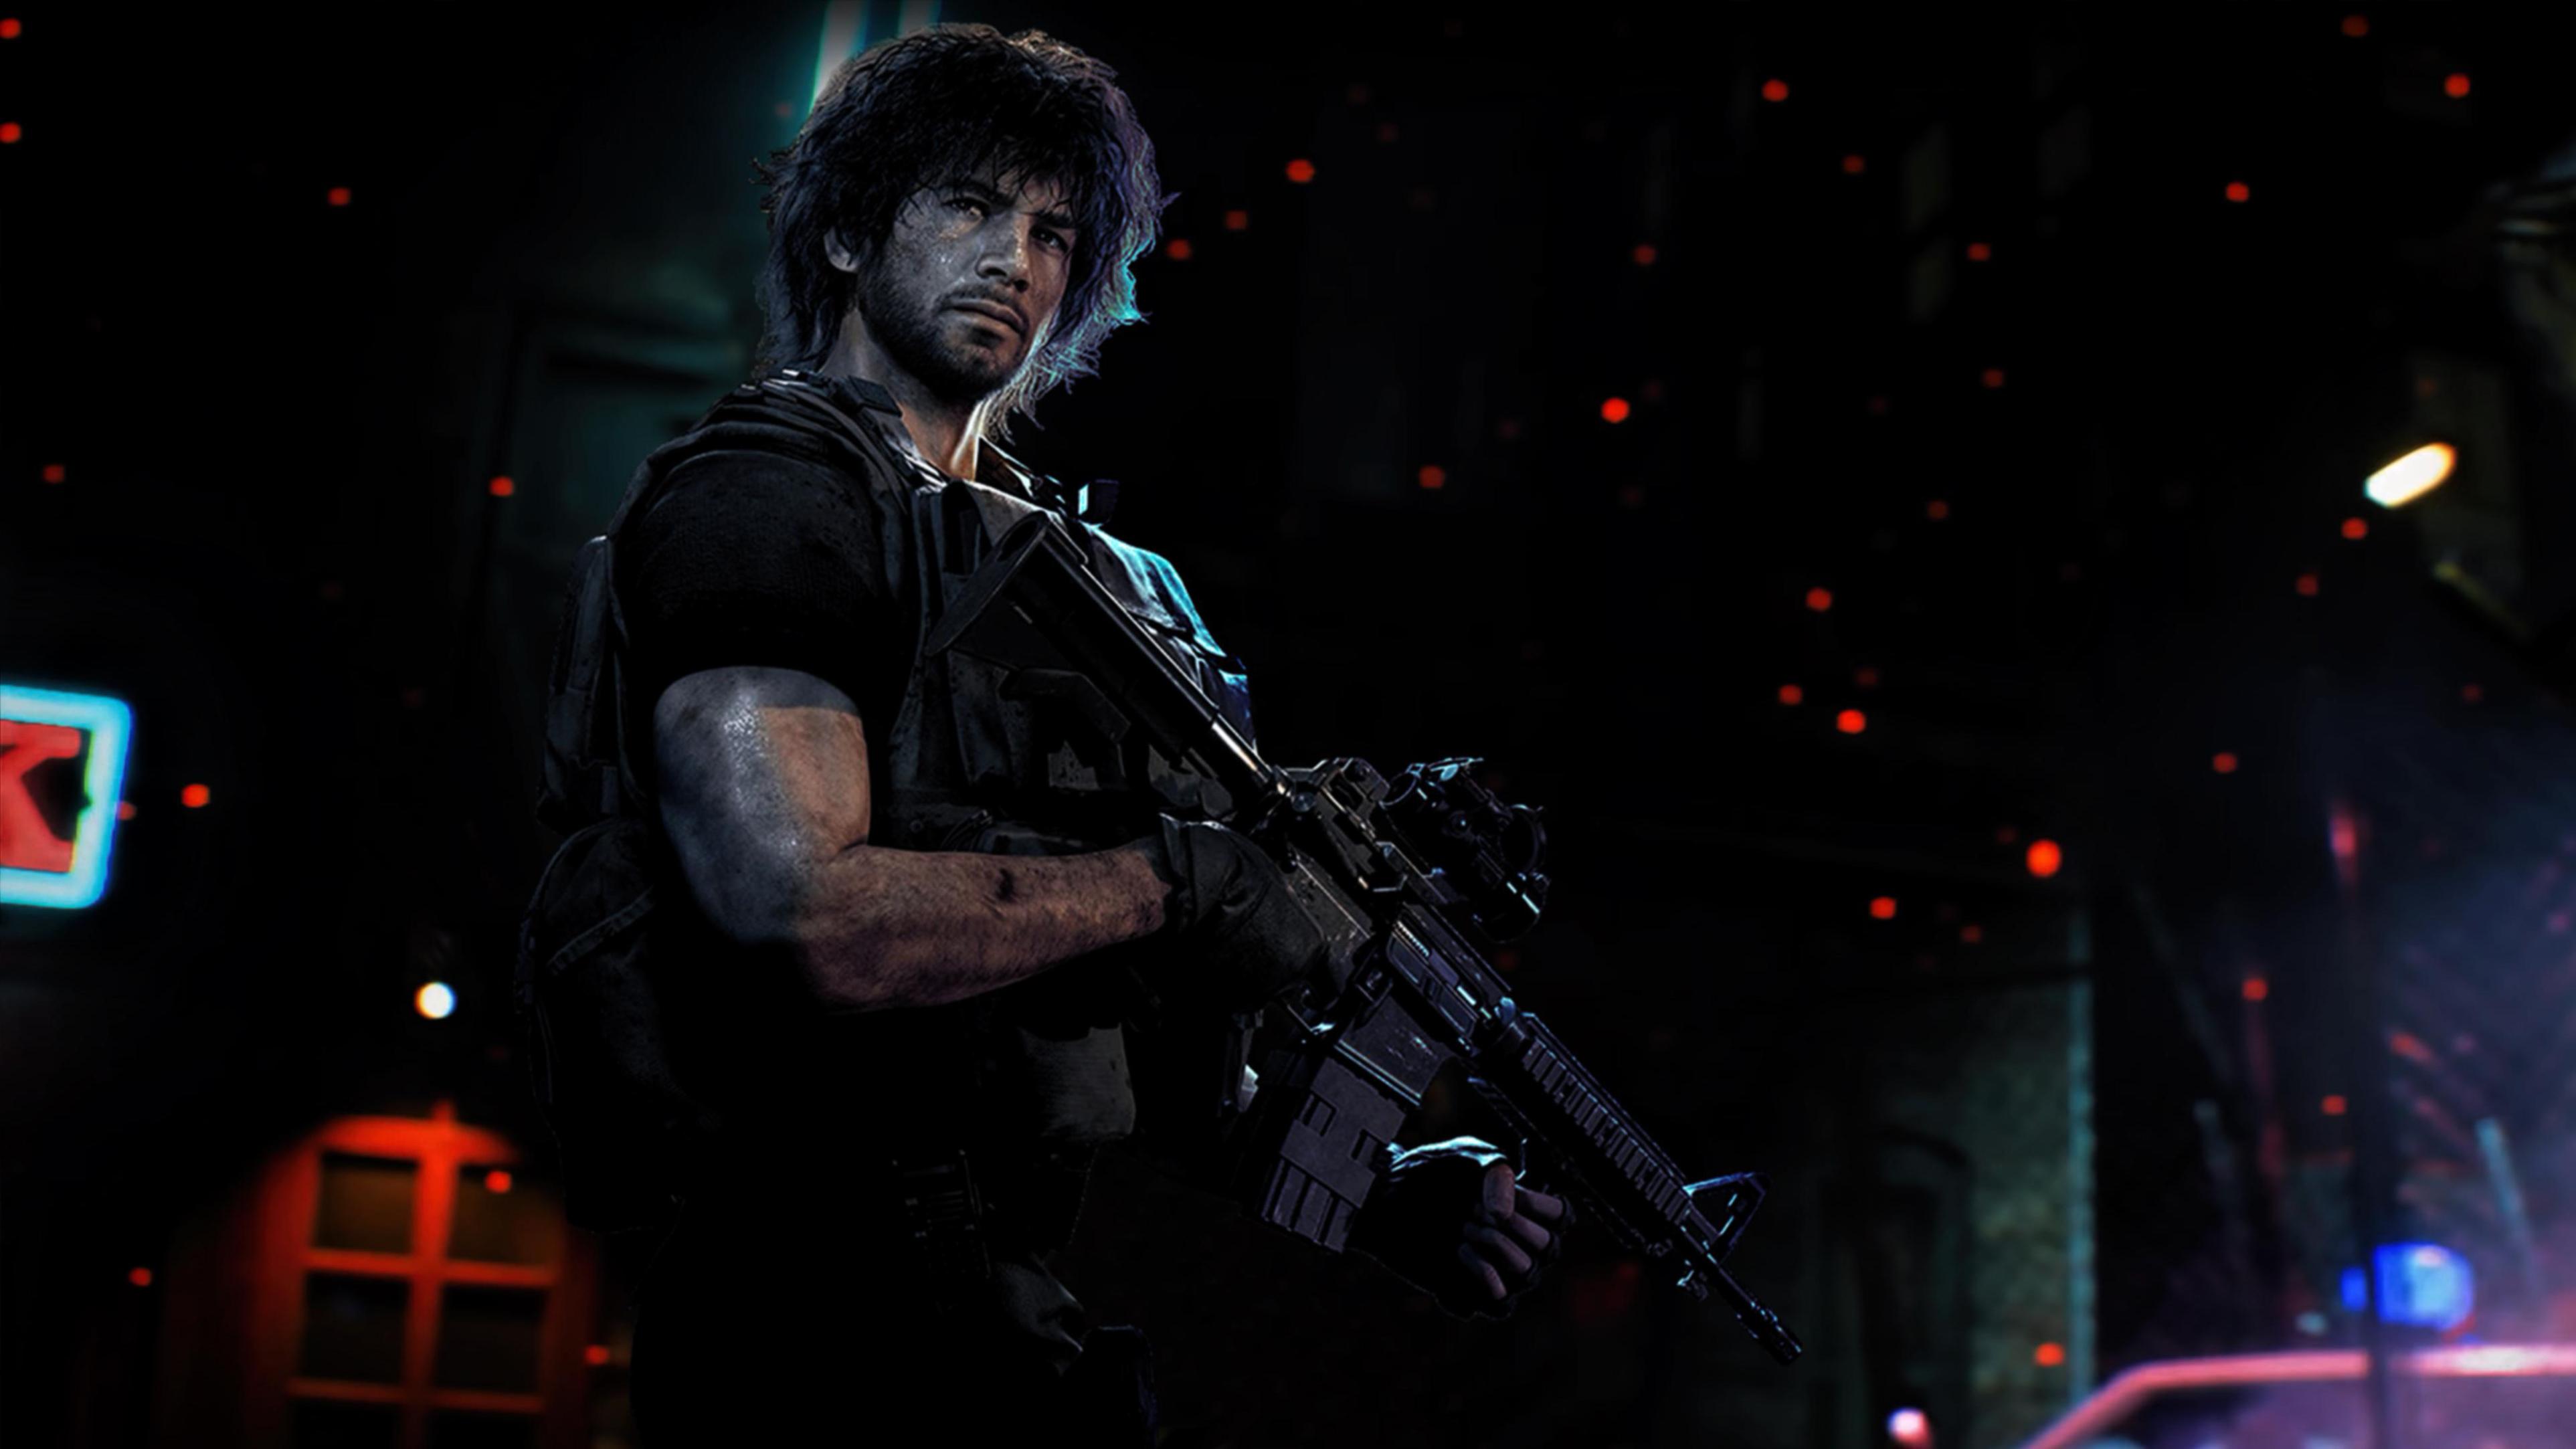 4k Carlos Oliveira Resident Evil 3 Wallpaper Hd Games 4k